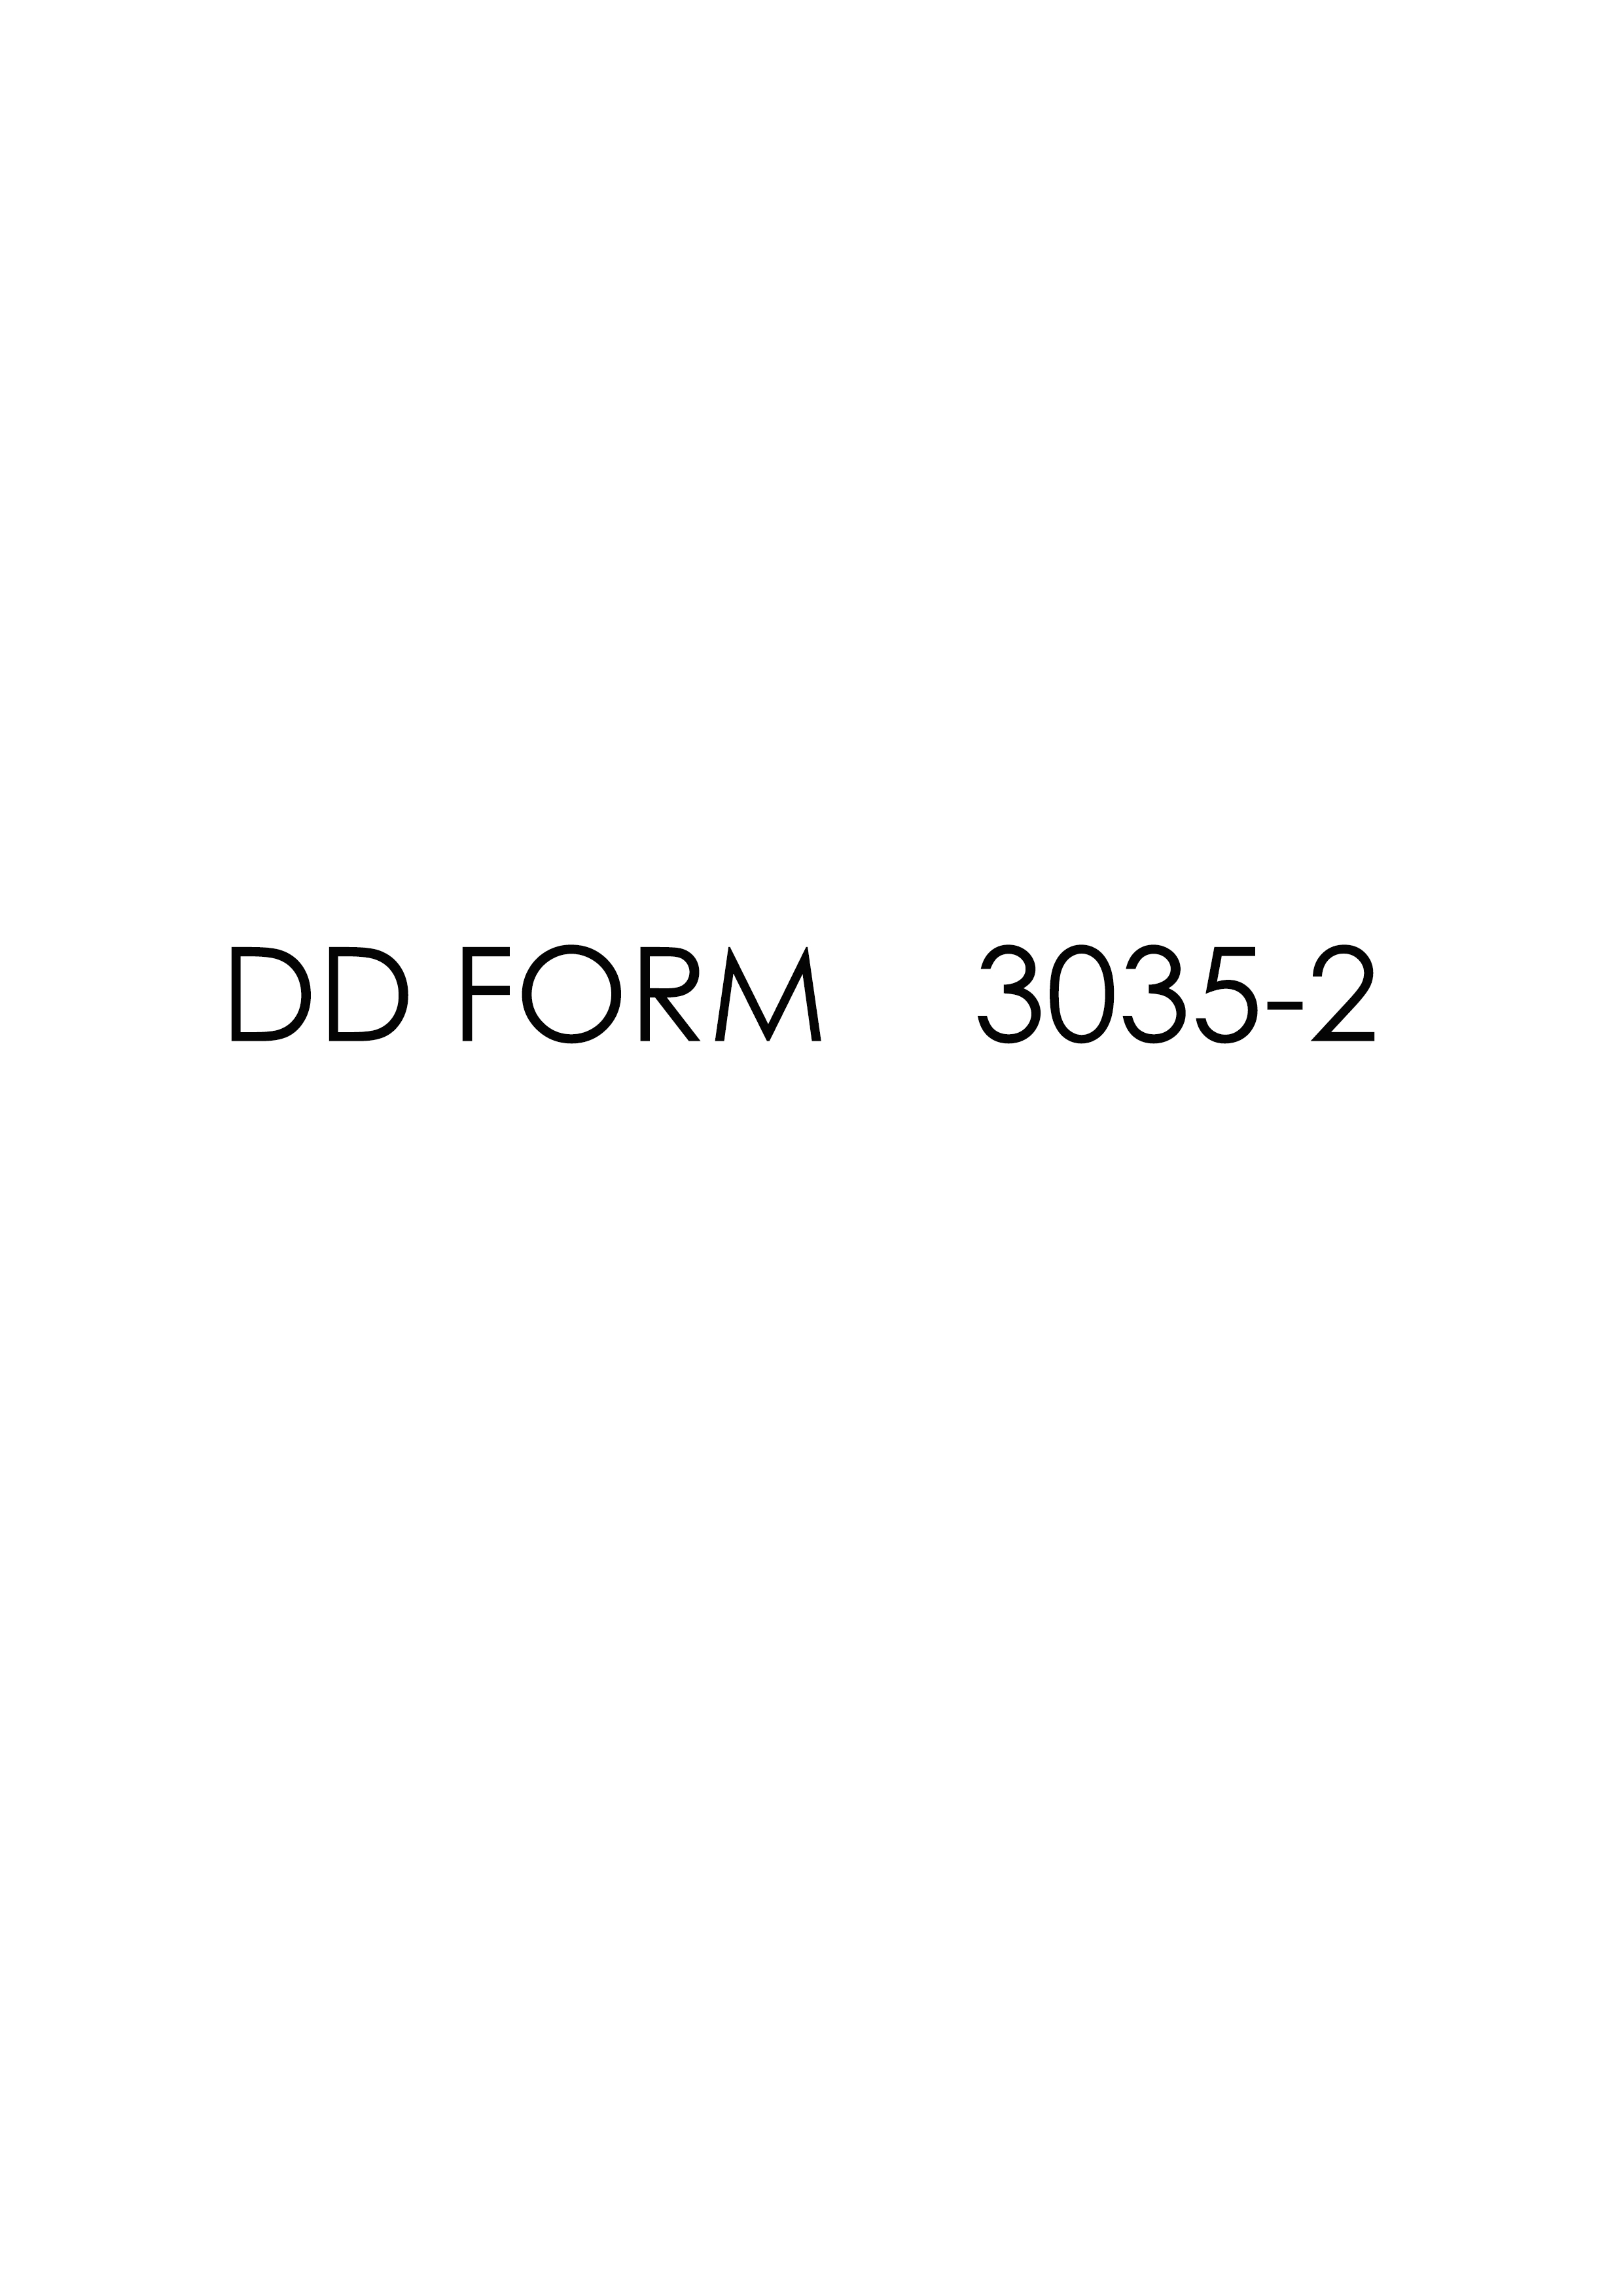 Download dd Form 3035-2 Free